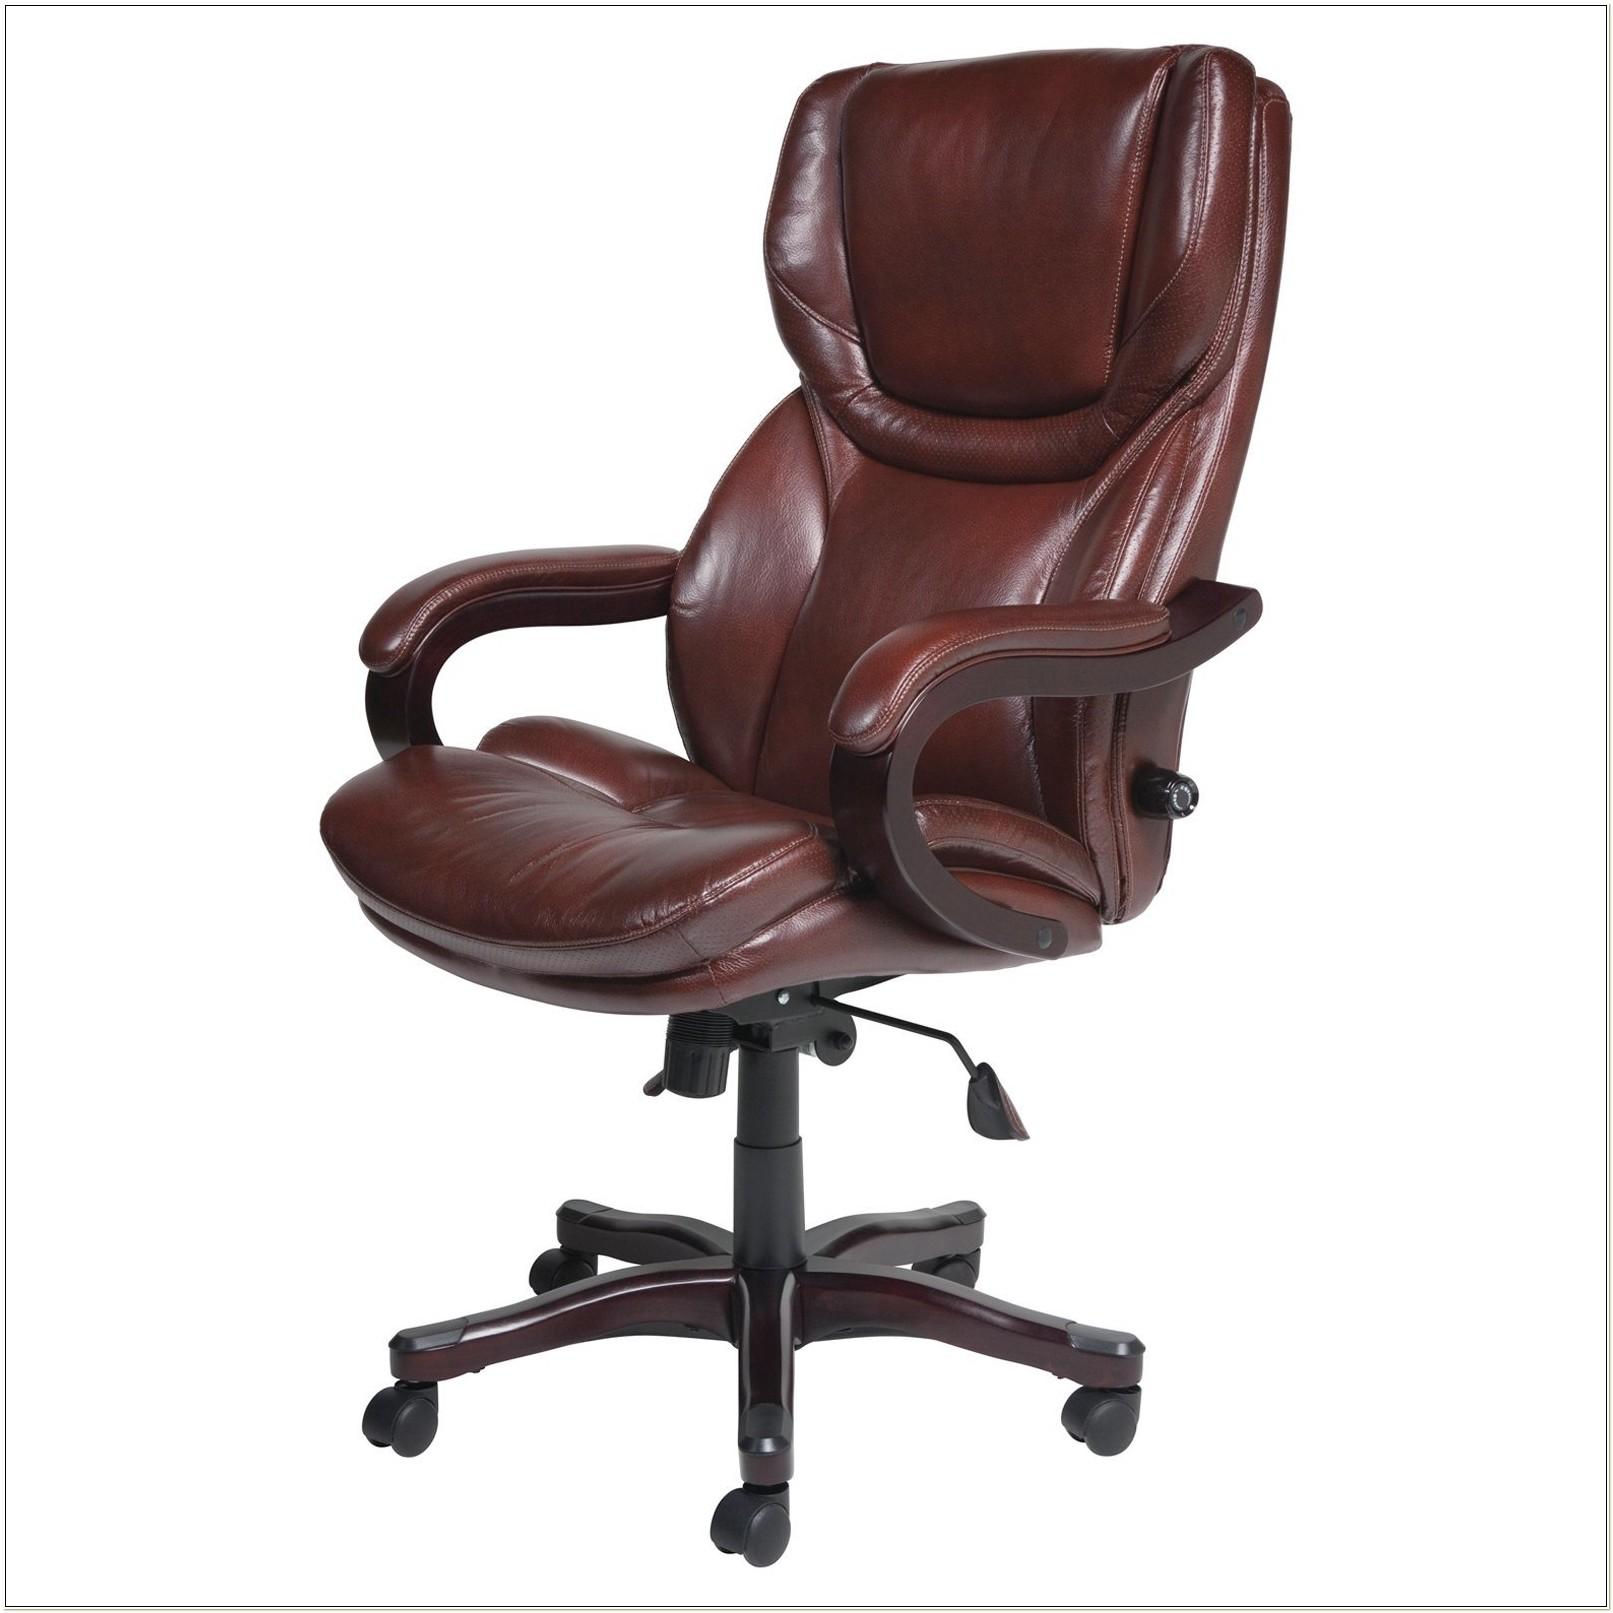 Serta Executive High Back Chair Instructions